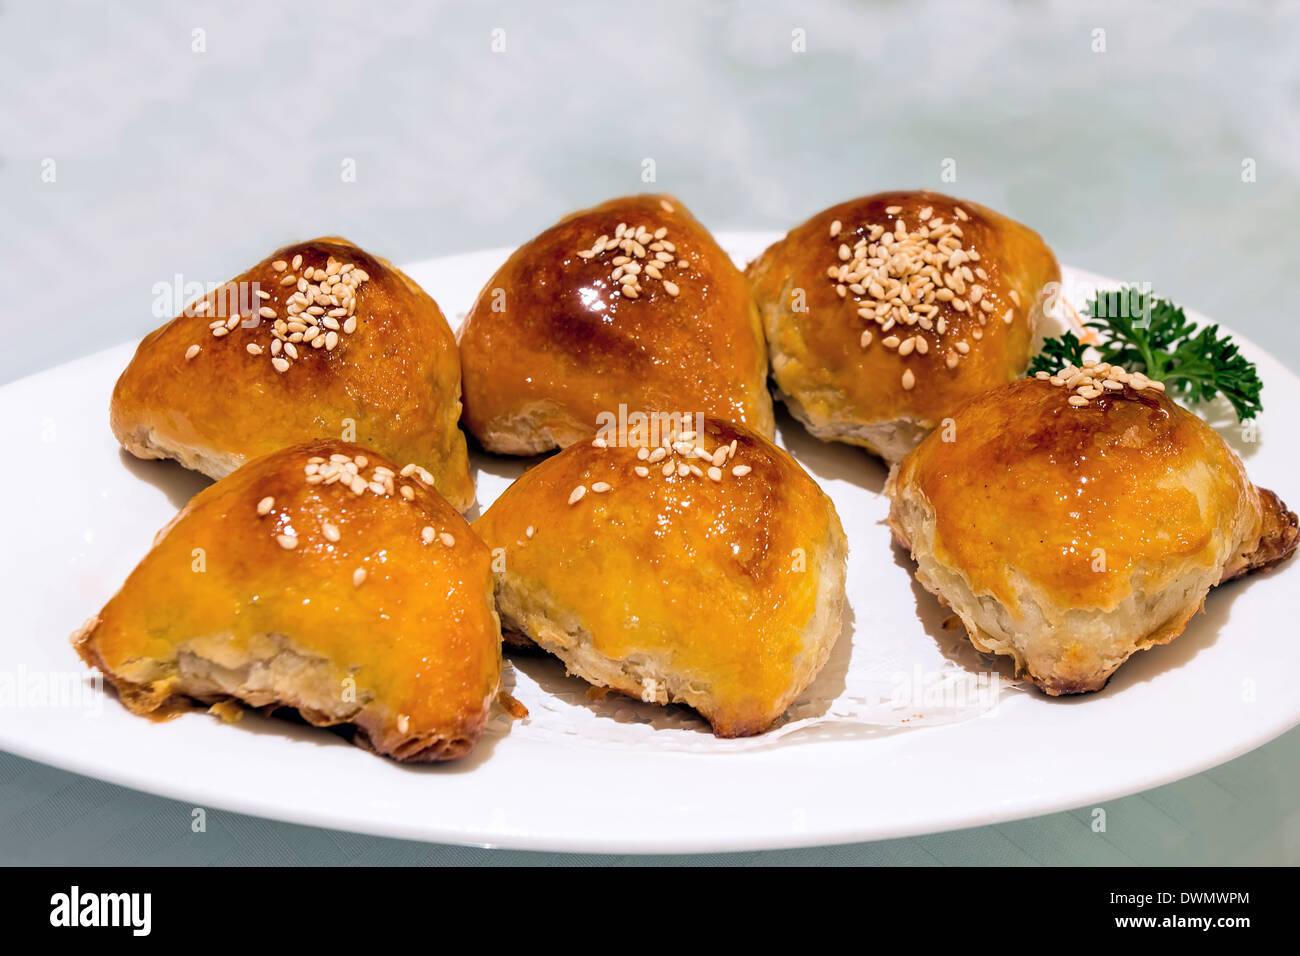 Char Siu Sou Barbecue Pork Pastry Dim Sum Dish Closeup - Stock Image